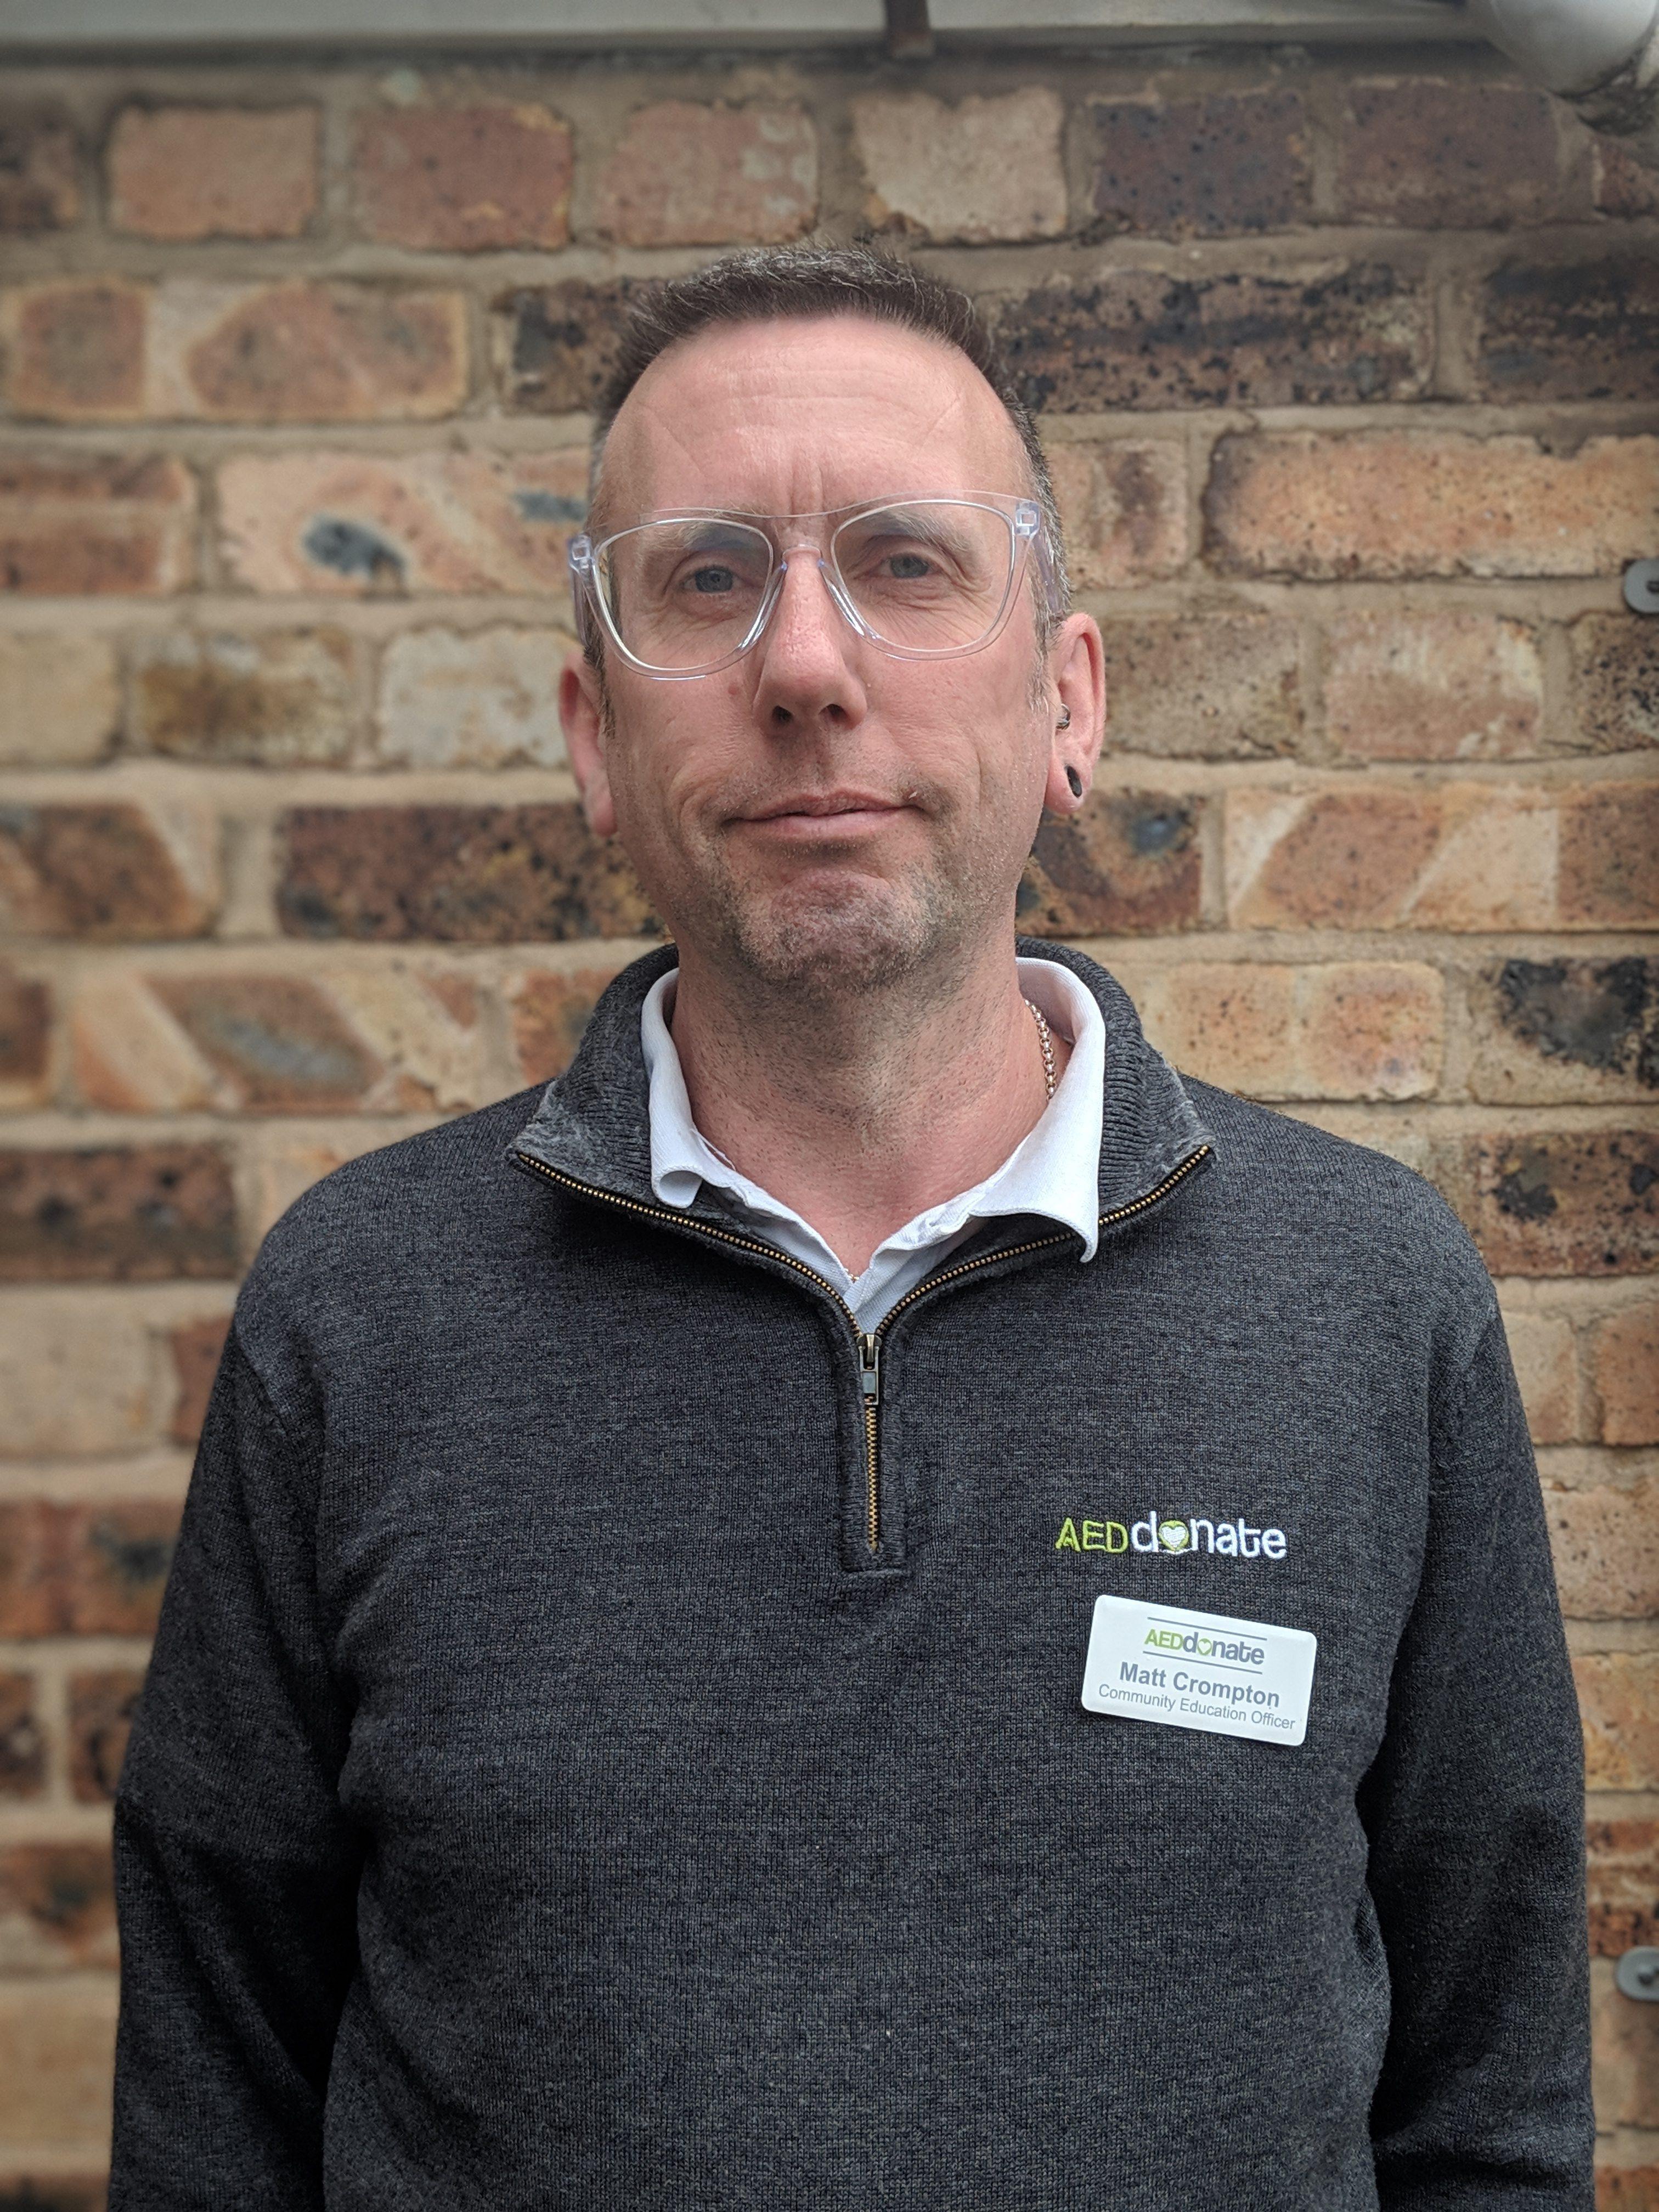 Portrait of Matt Crompton - Community Education Officer